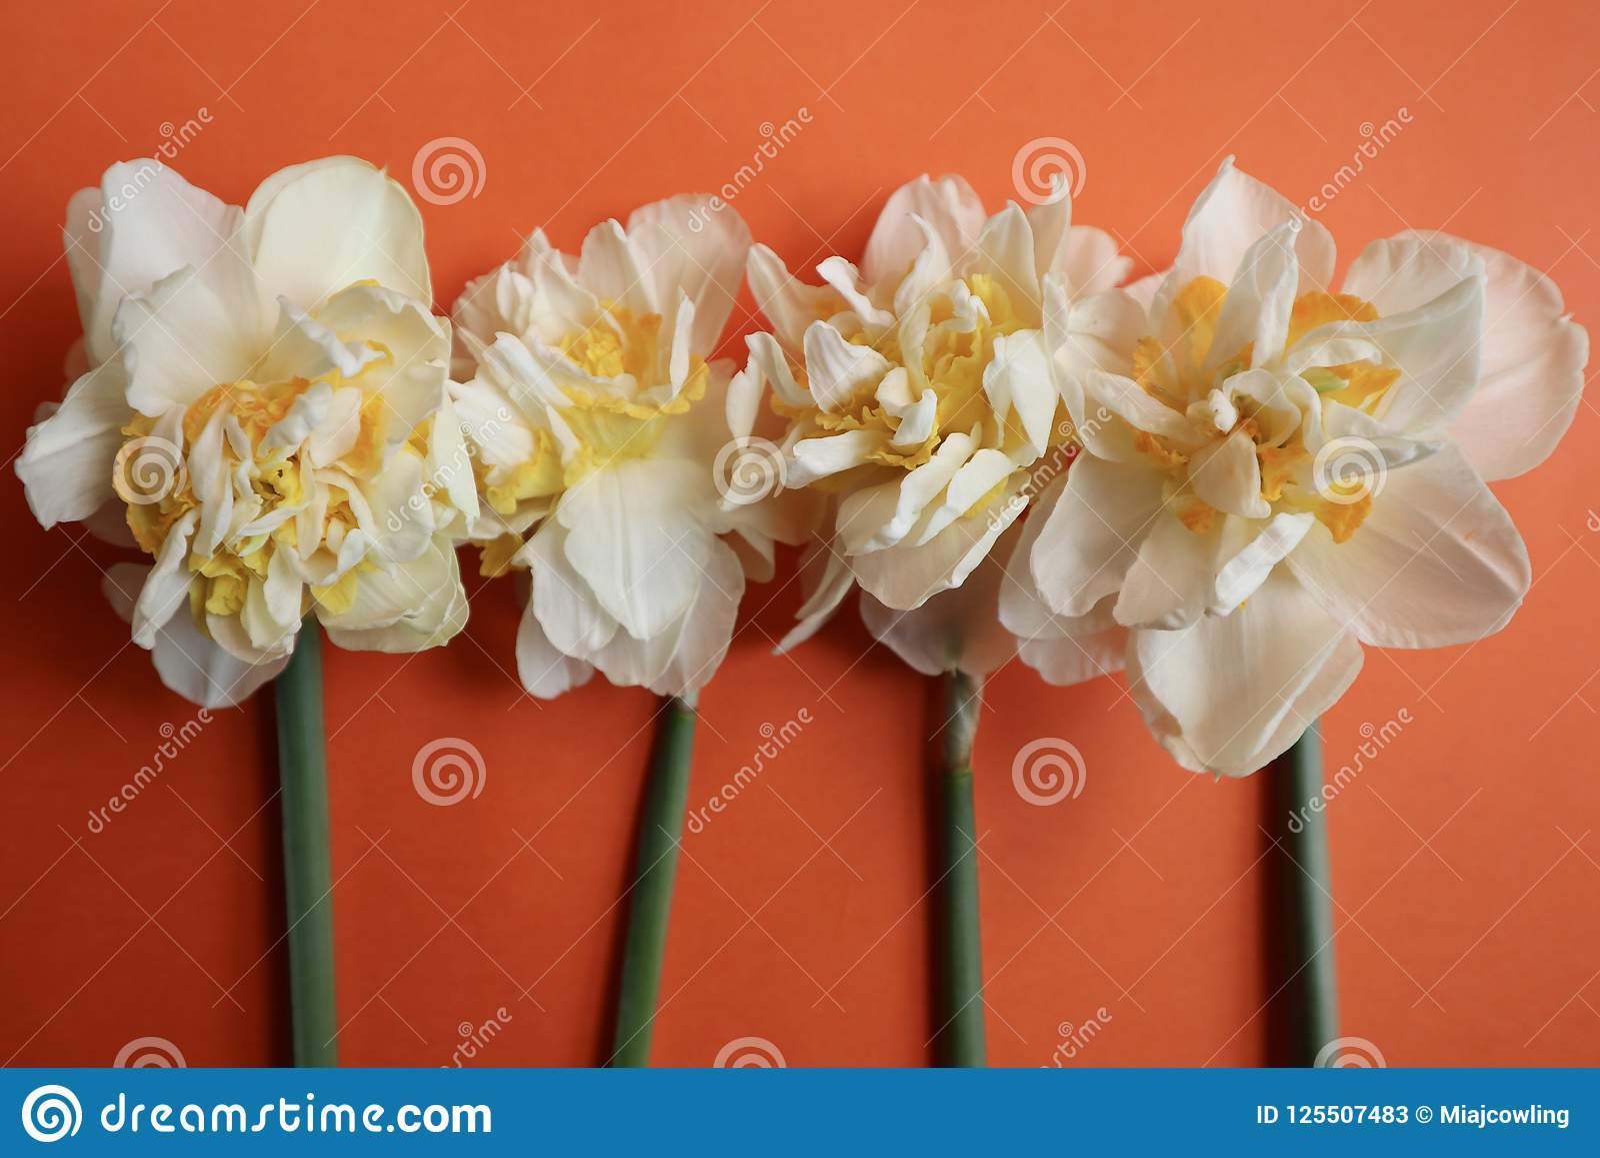 Vier Gele narcissen op Heldere Oranje Achtergrond